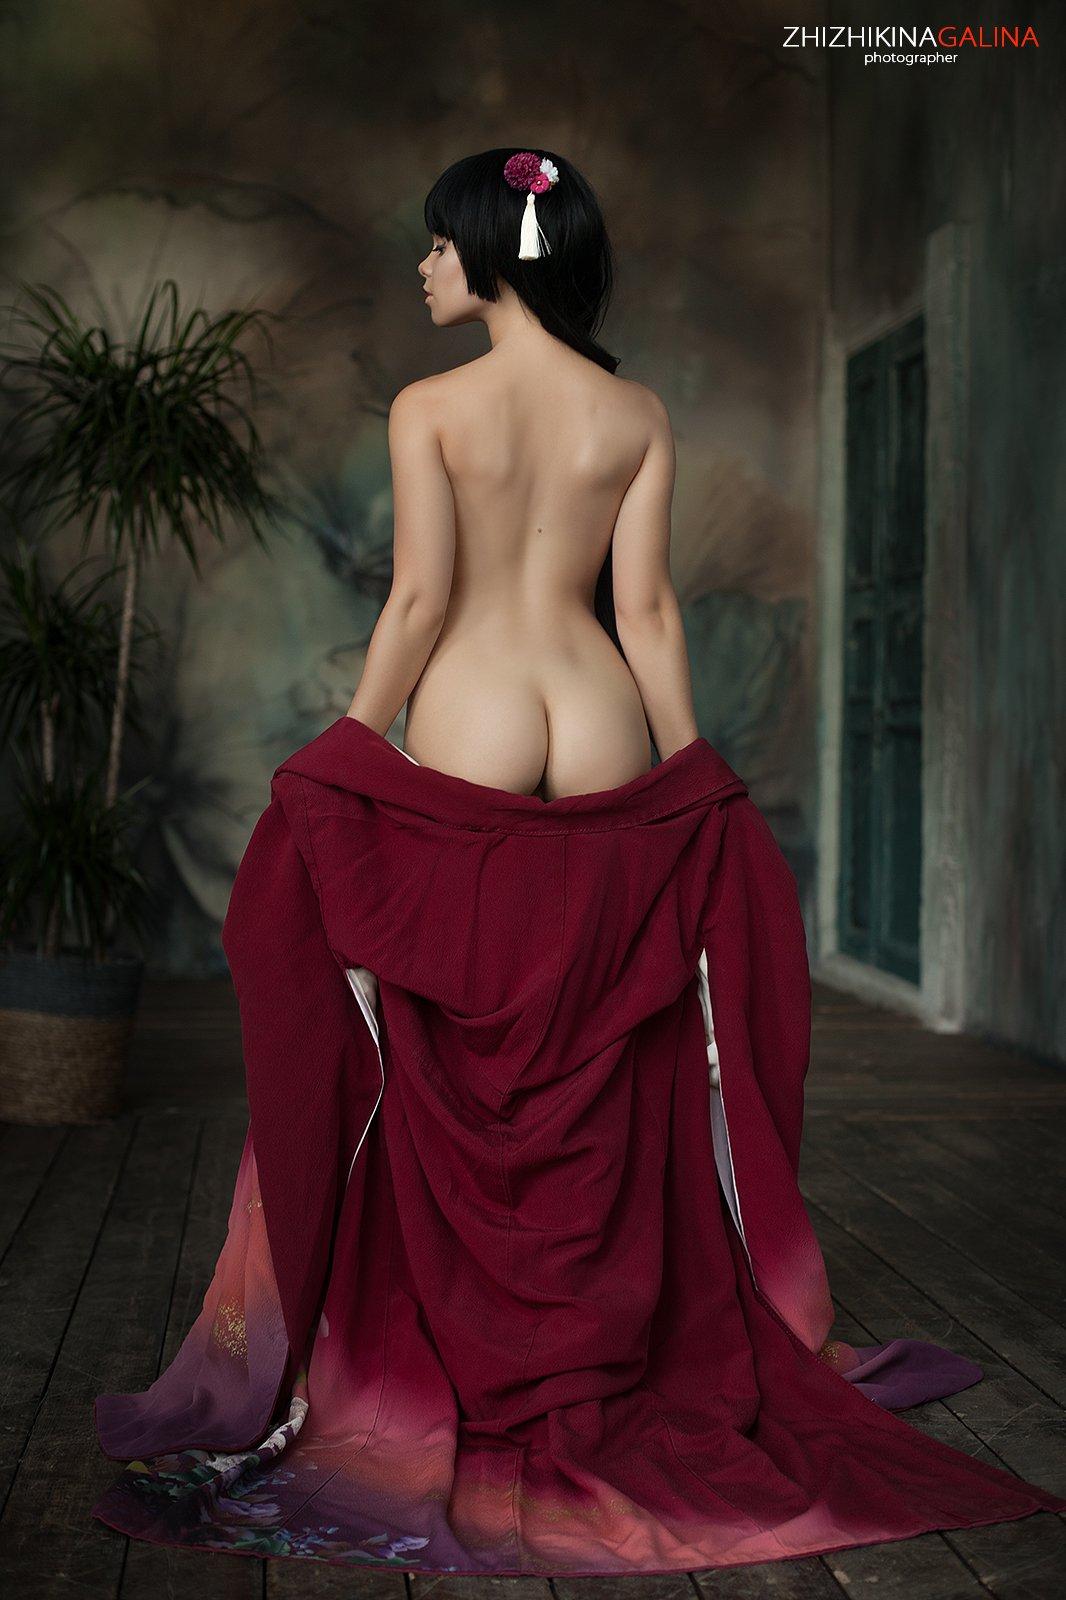 гейша, японка, портрет, ню, артню, девушка, попа, girl, face, nu, nude, beauty,, Галина Жижикина